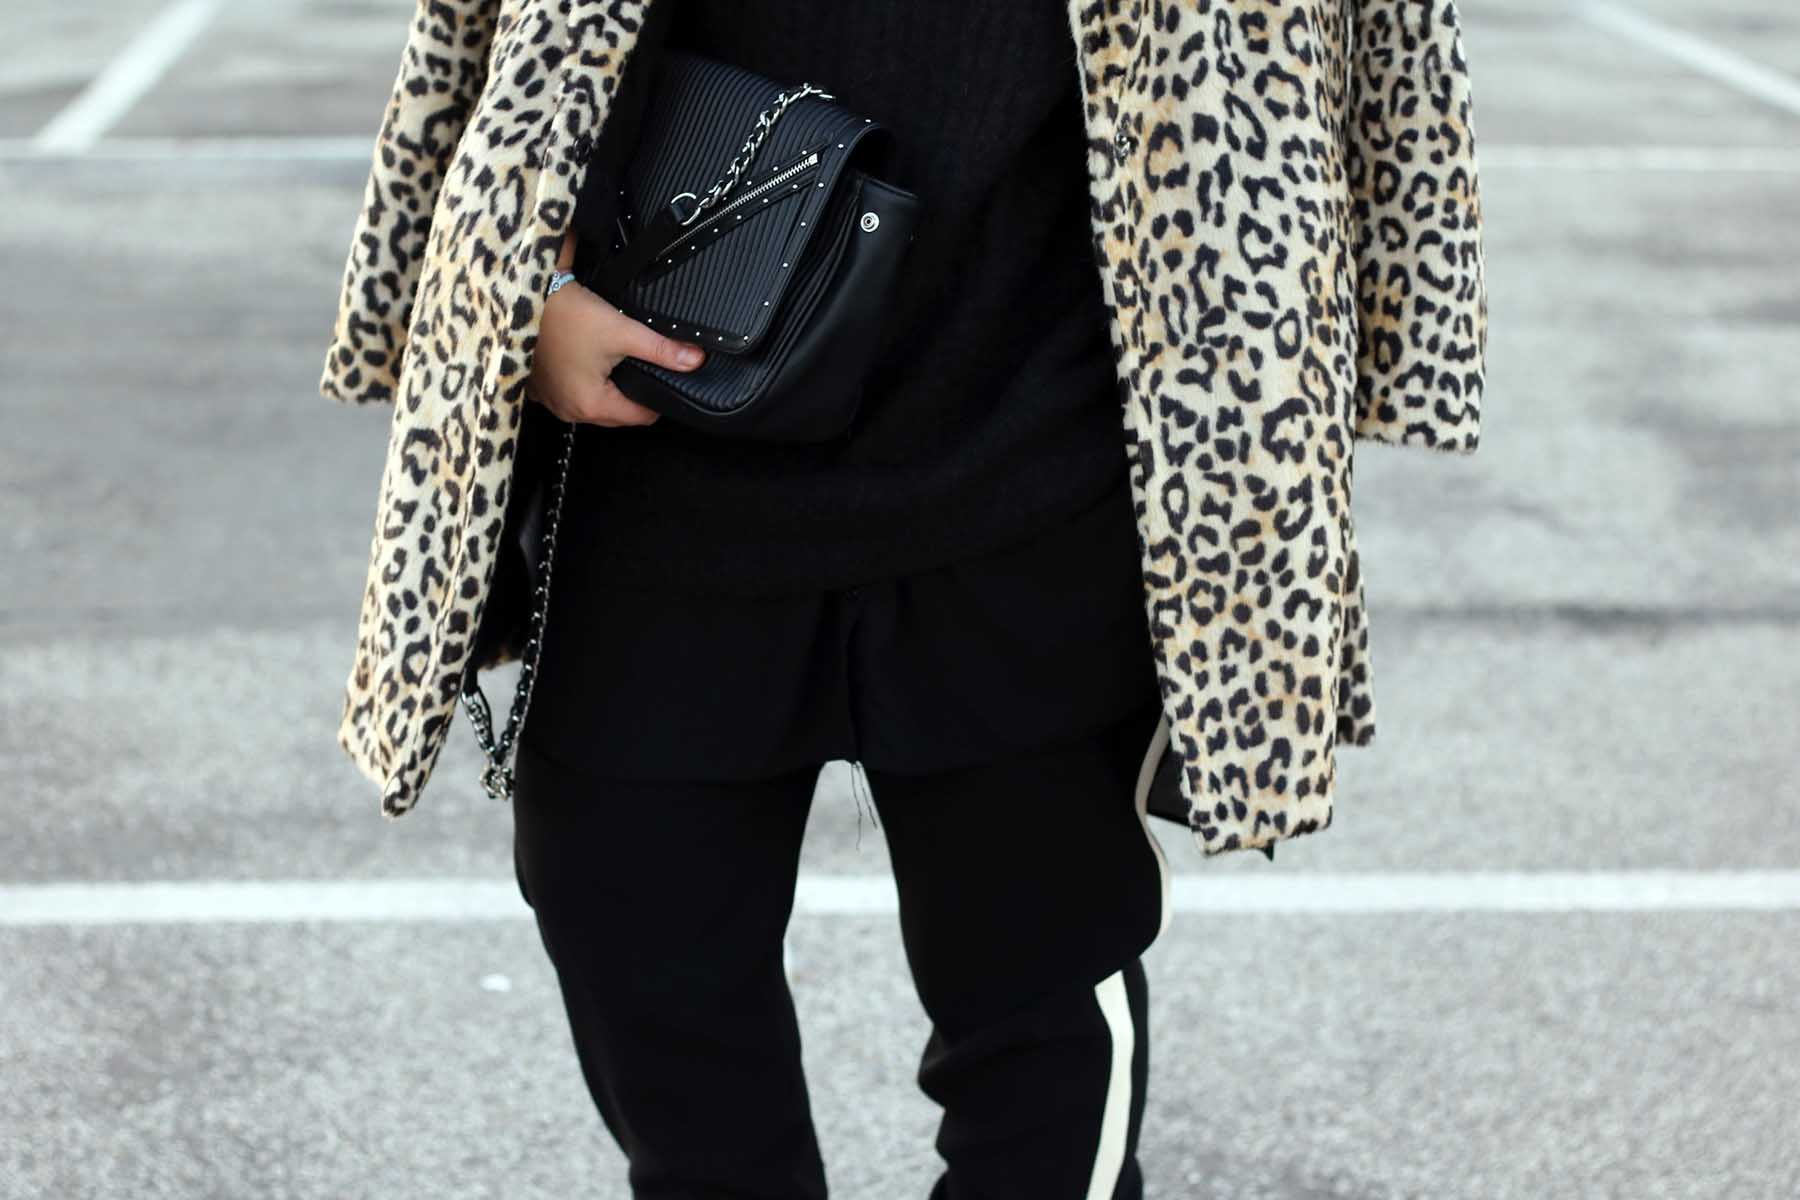 outift-leomantel-mantel-winter-leoparden-modeblog-fashionblog-look-braunschweig18